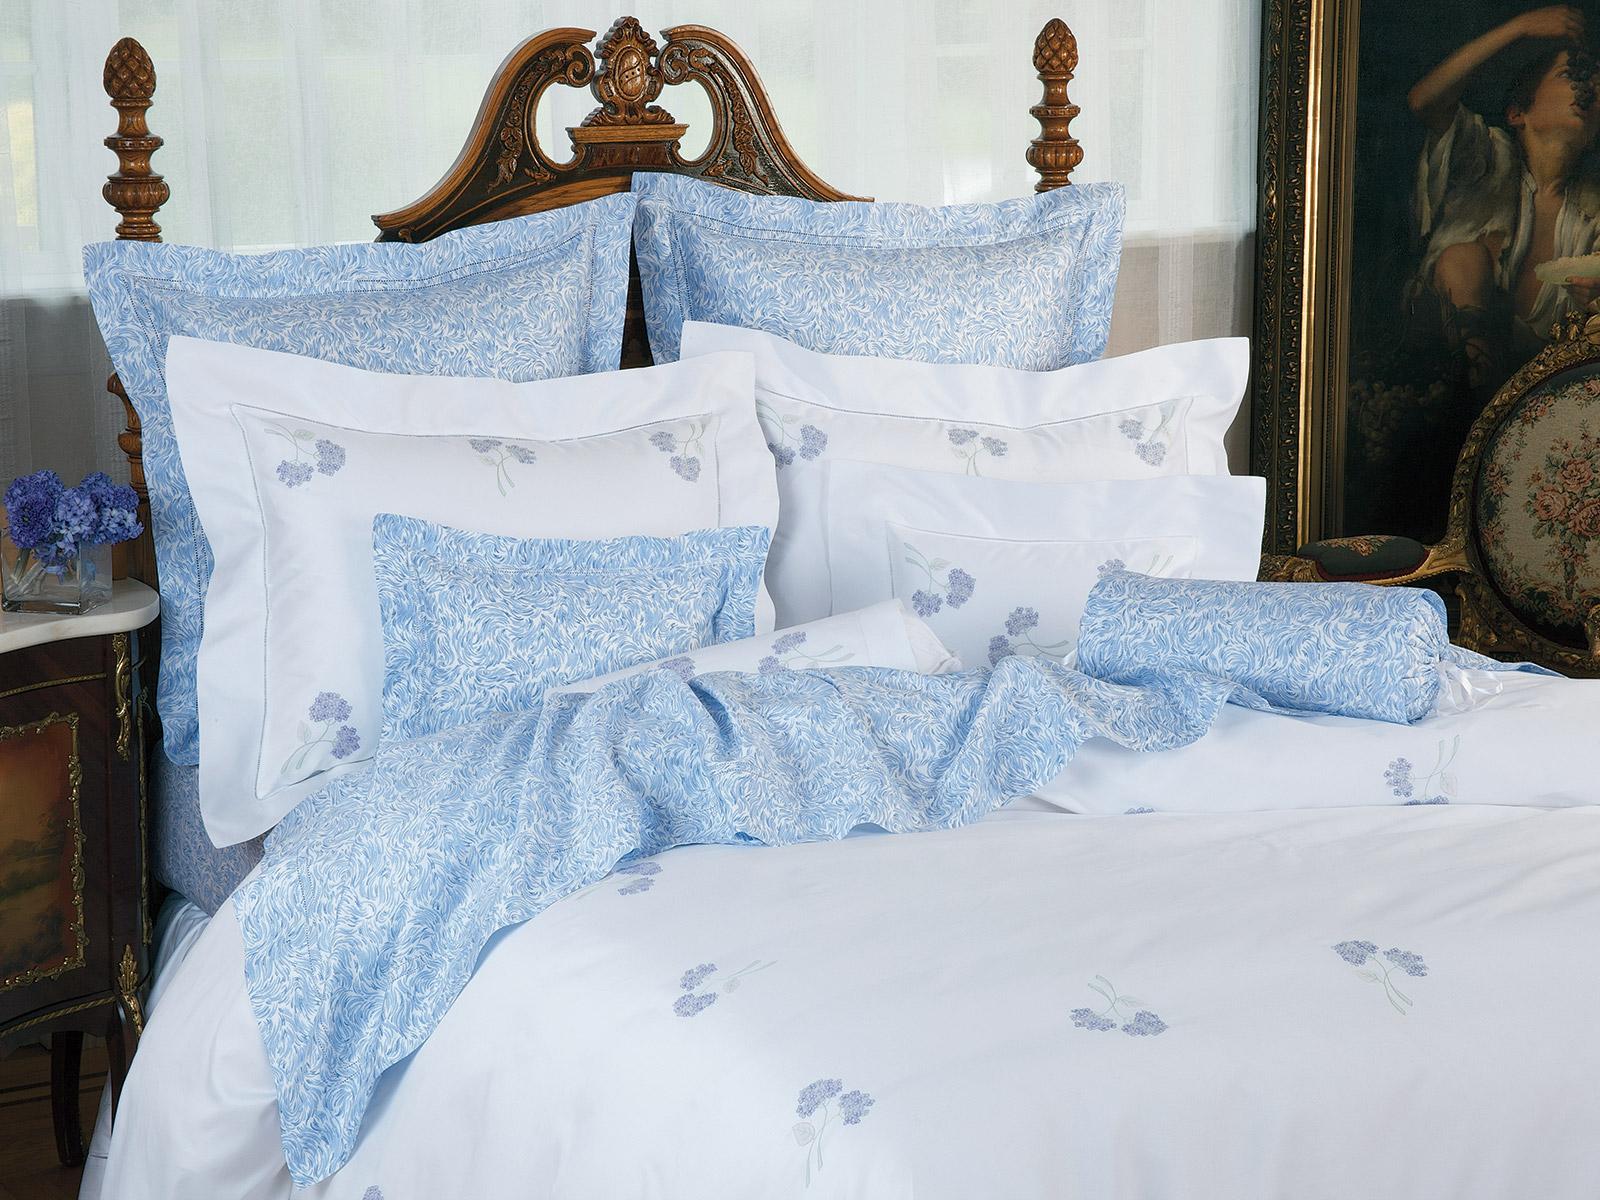 Hydrangea Blossoms Luxury Bedding Italian Bed Linens